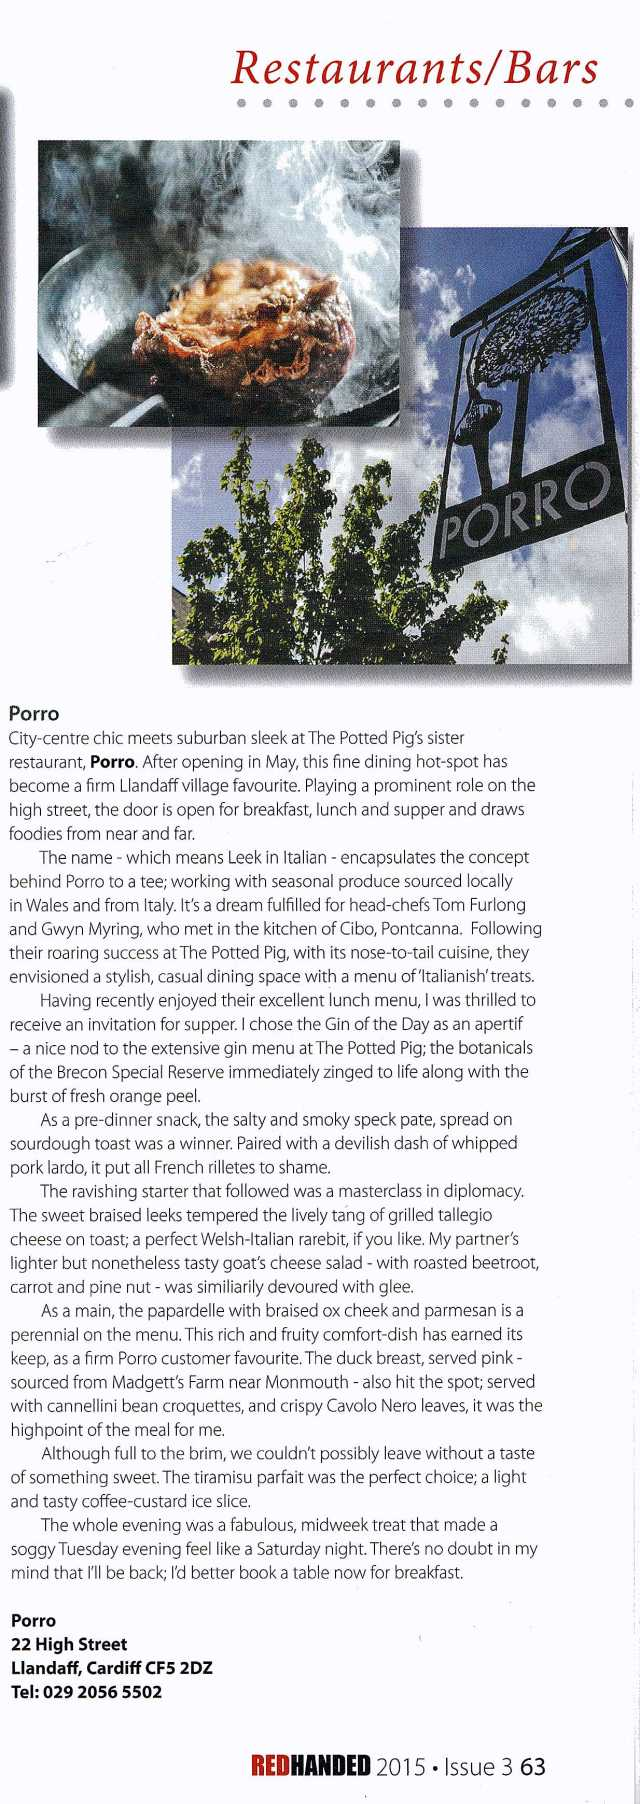 Porro Review